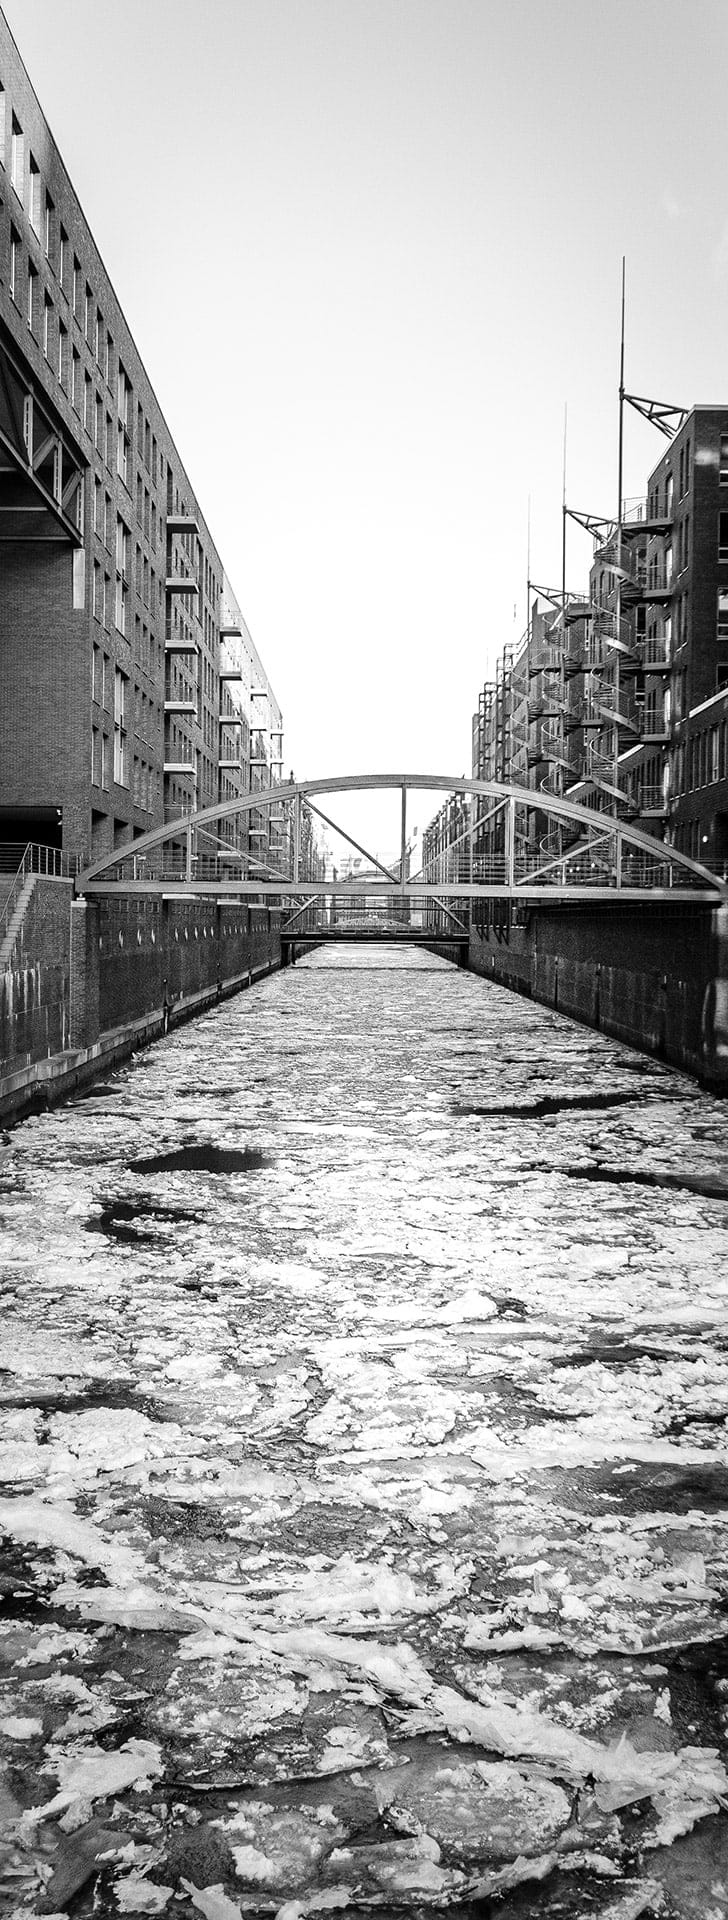 artnorama - Crushed Canal